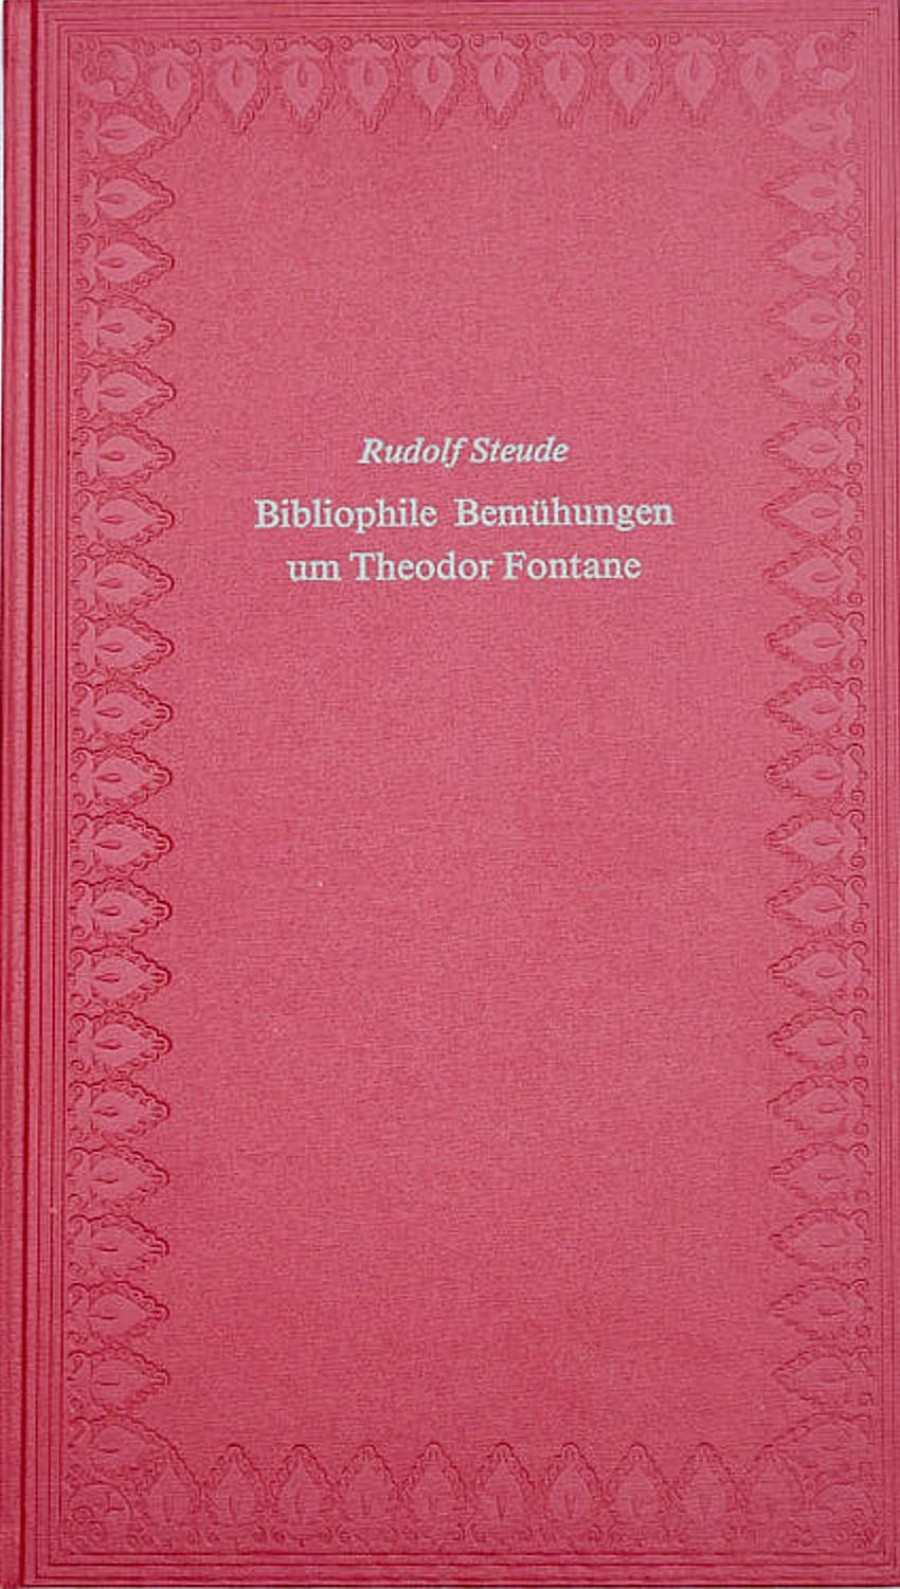 Rudolf Steude:Bibliophile Bemühungen um Theodor Fontane